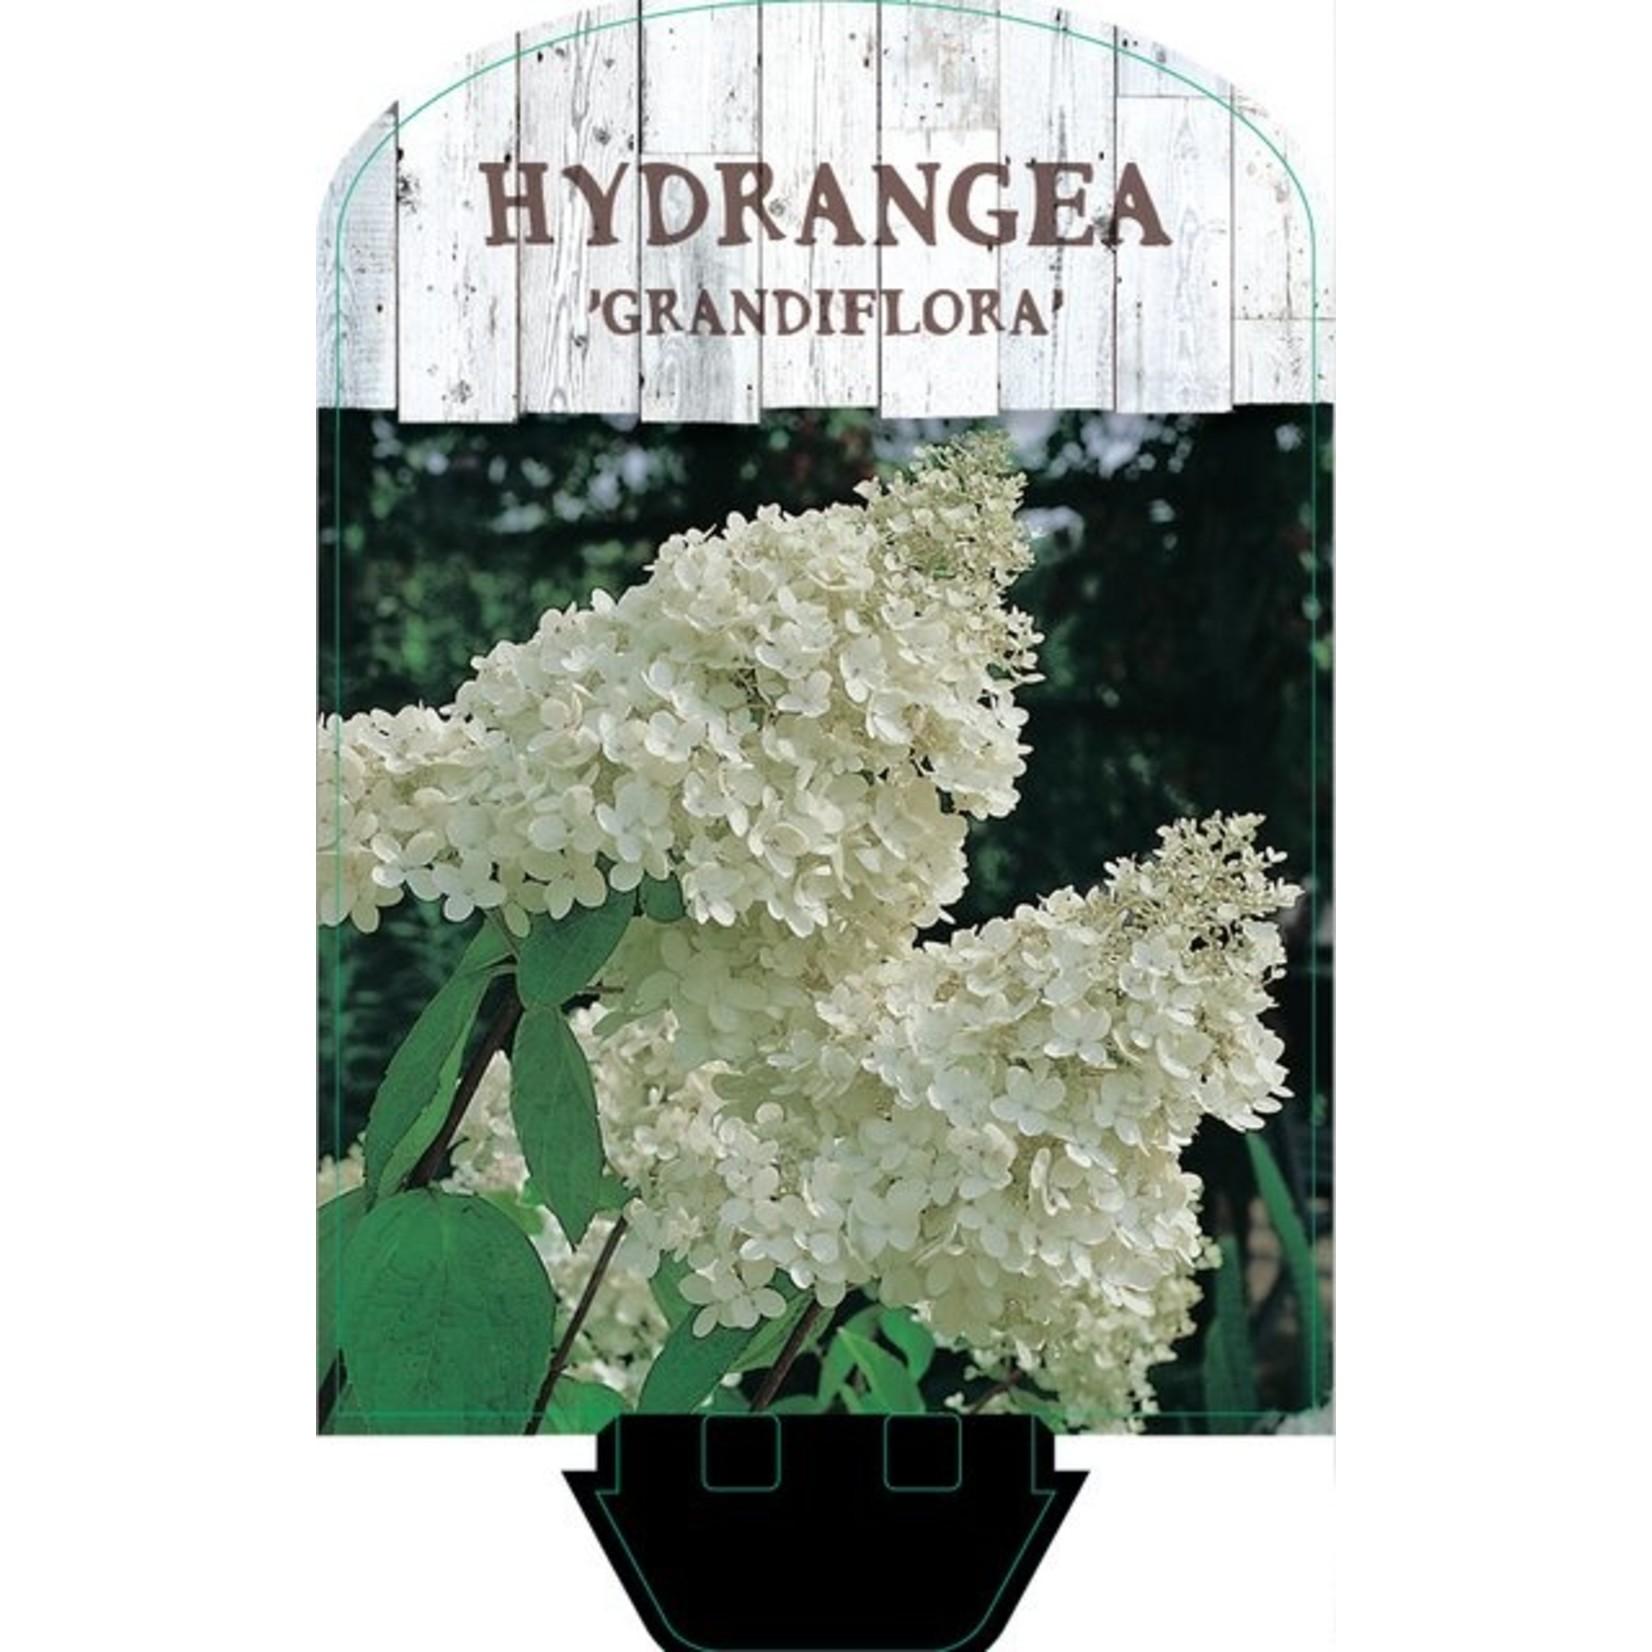 Hydrangea paniculata 'Grandiflora' (Pluimhortensia)